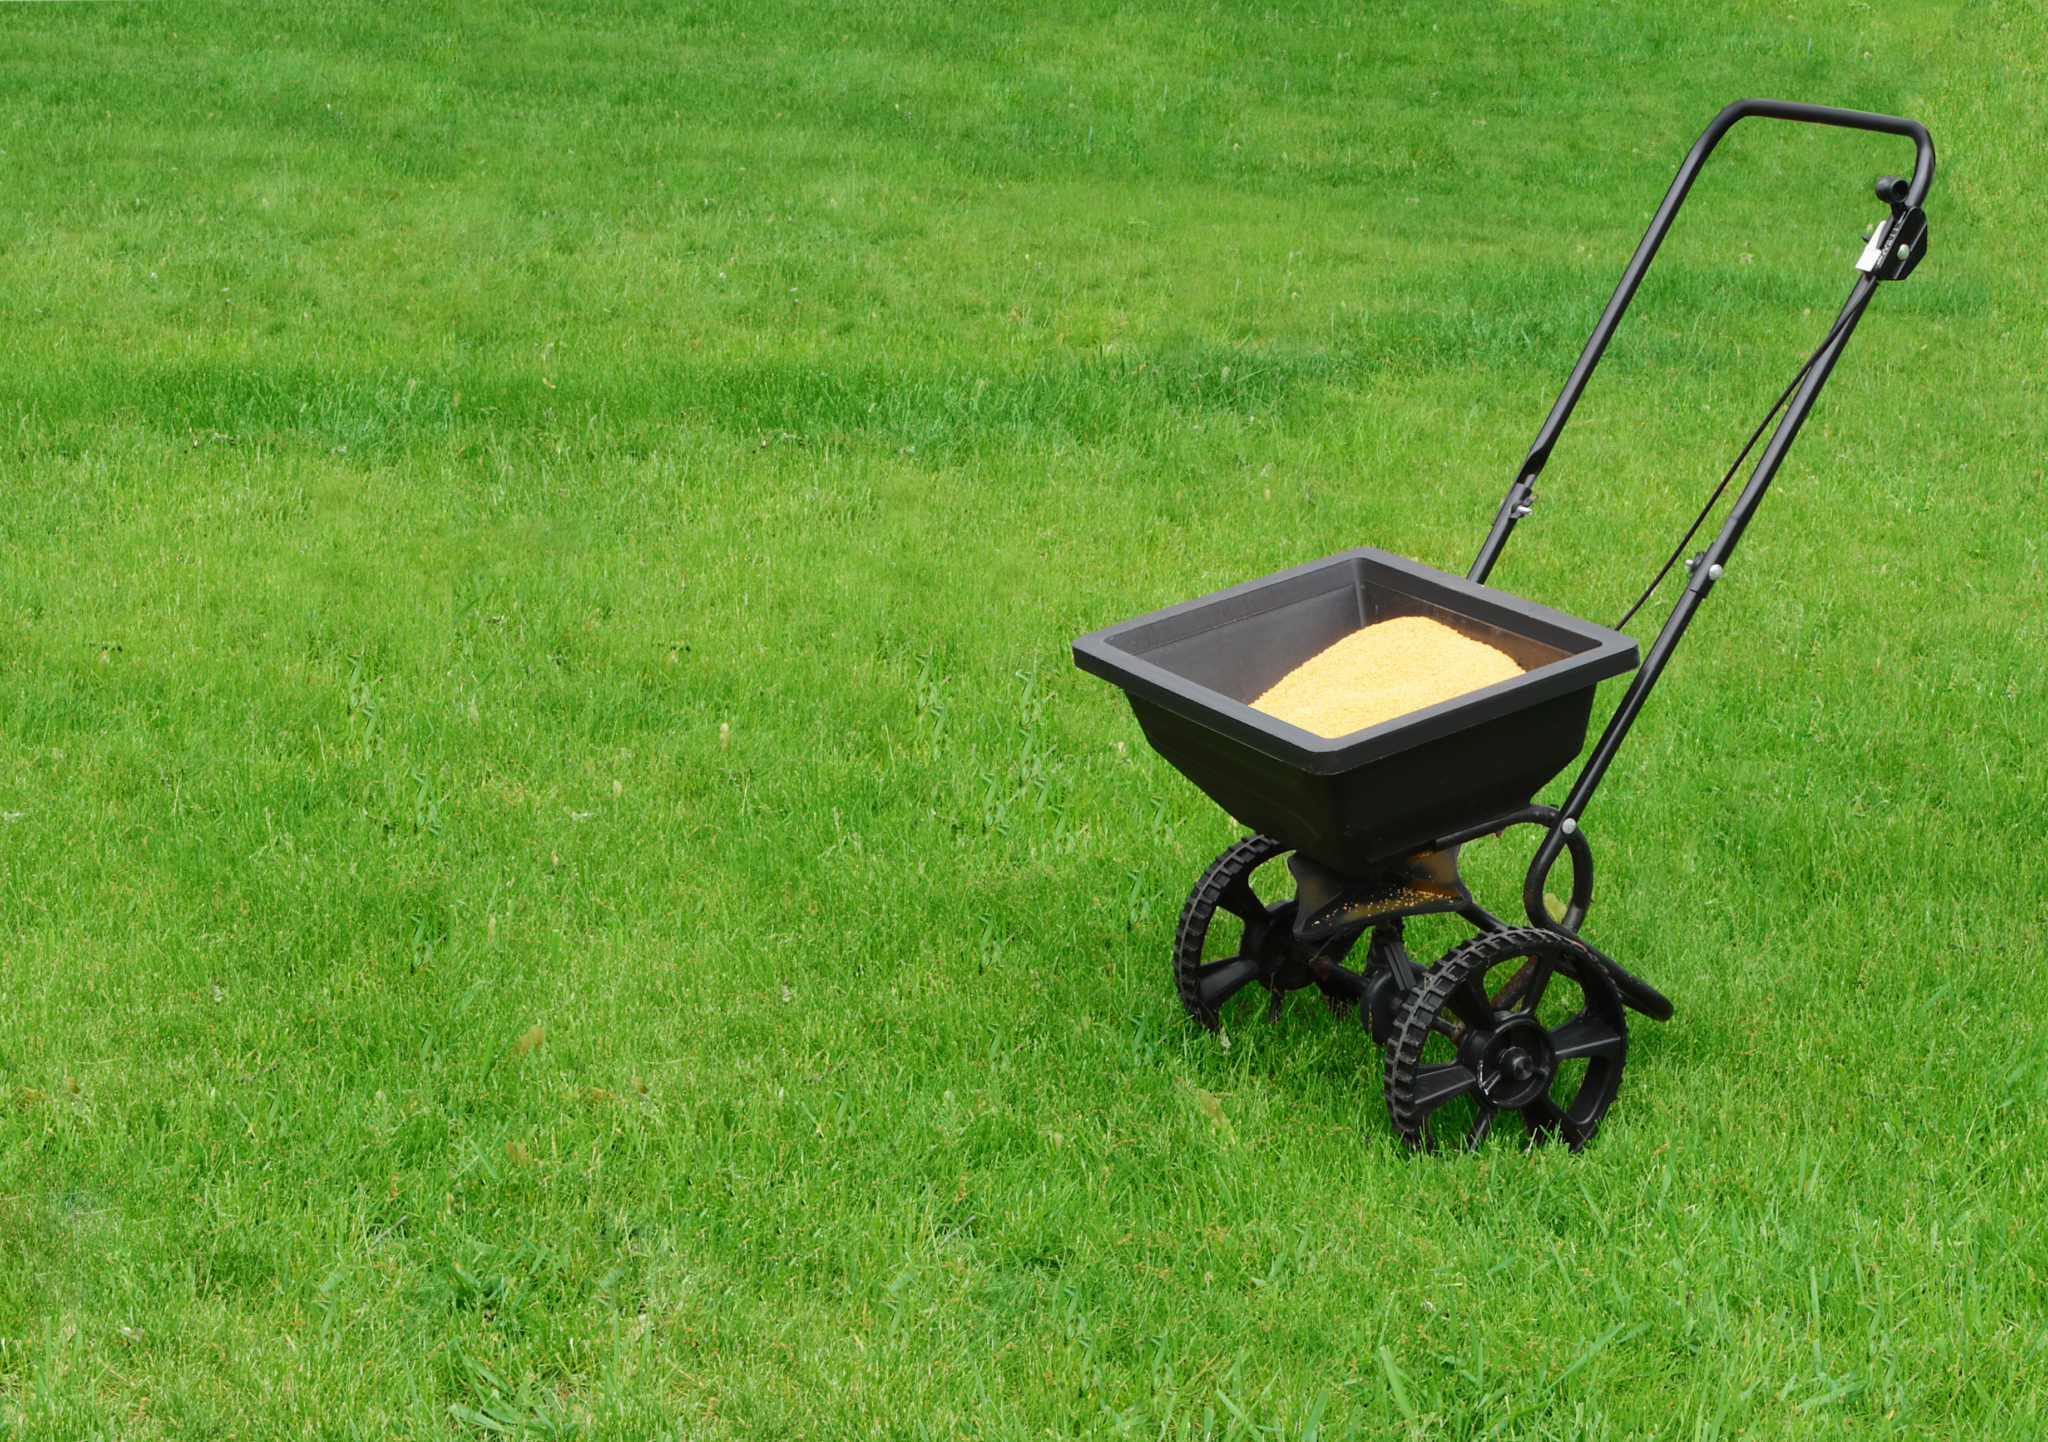 Rasen düngen richtige Menge